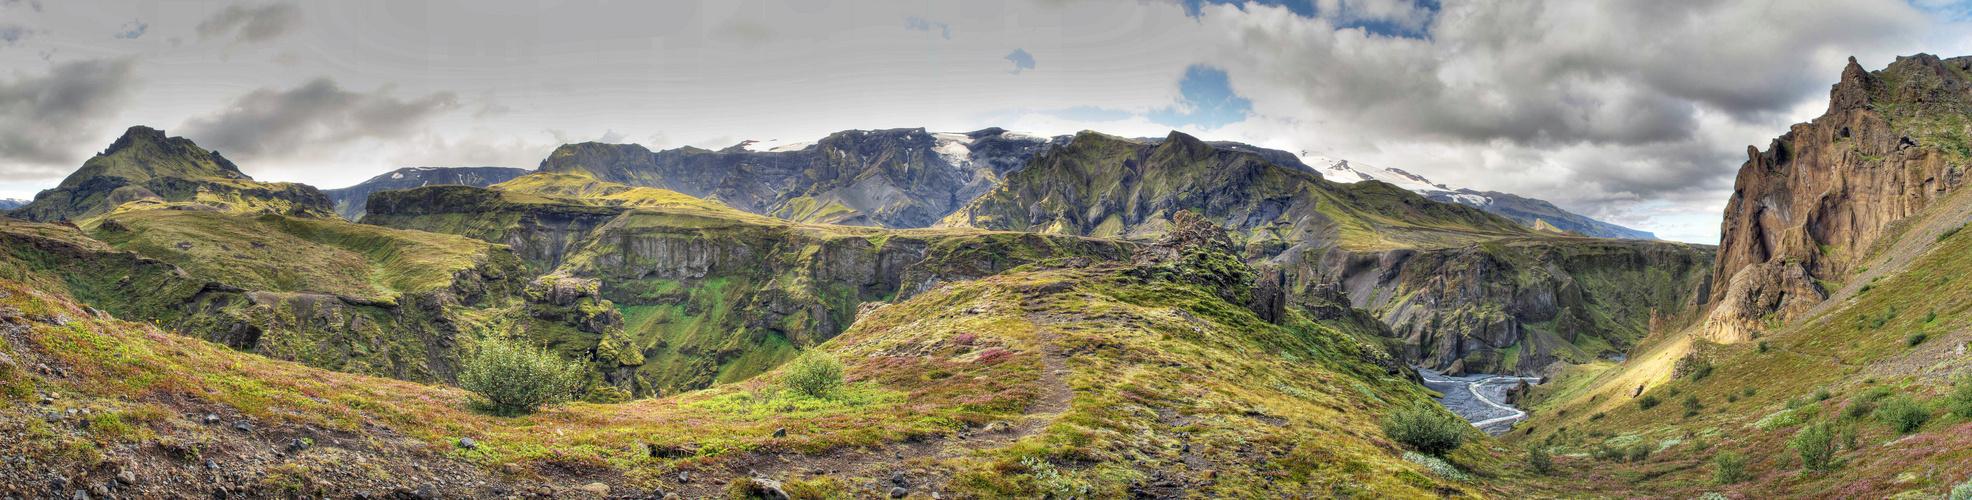 Godaland (Island) Panorama HDR mit Eyjafjallajökull-Gletscher im Hintergrund